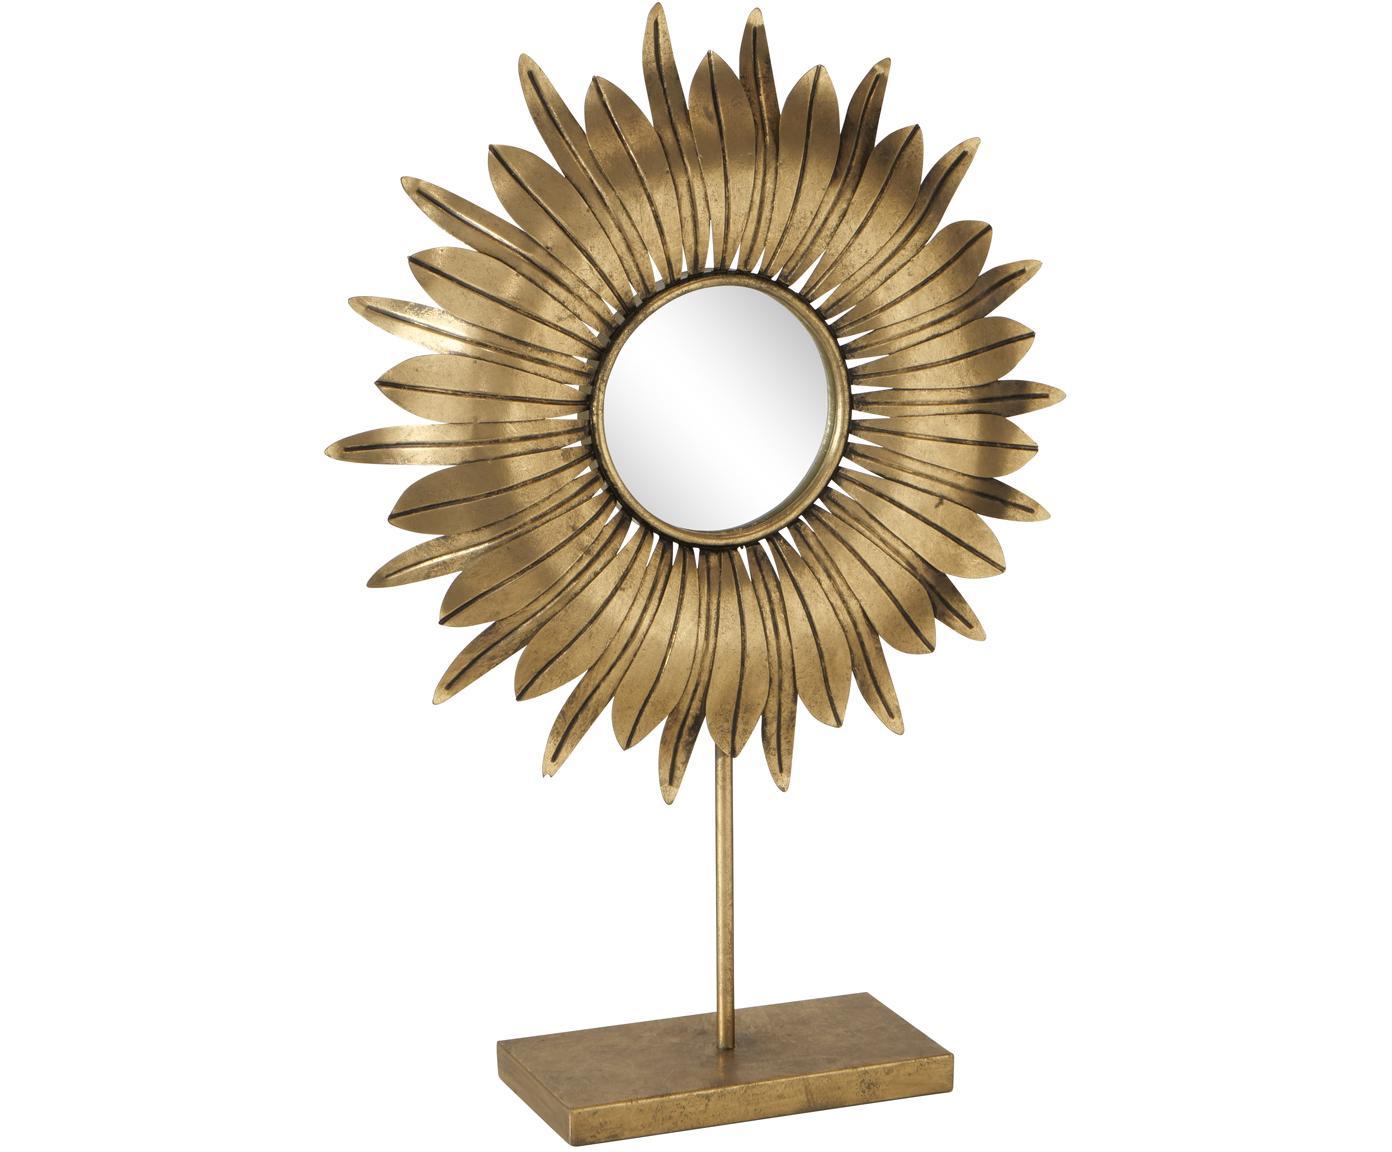 Deko-Objekt Oro, Metall, Spiegelglas, Messingfarben, 43 x 61 cm